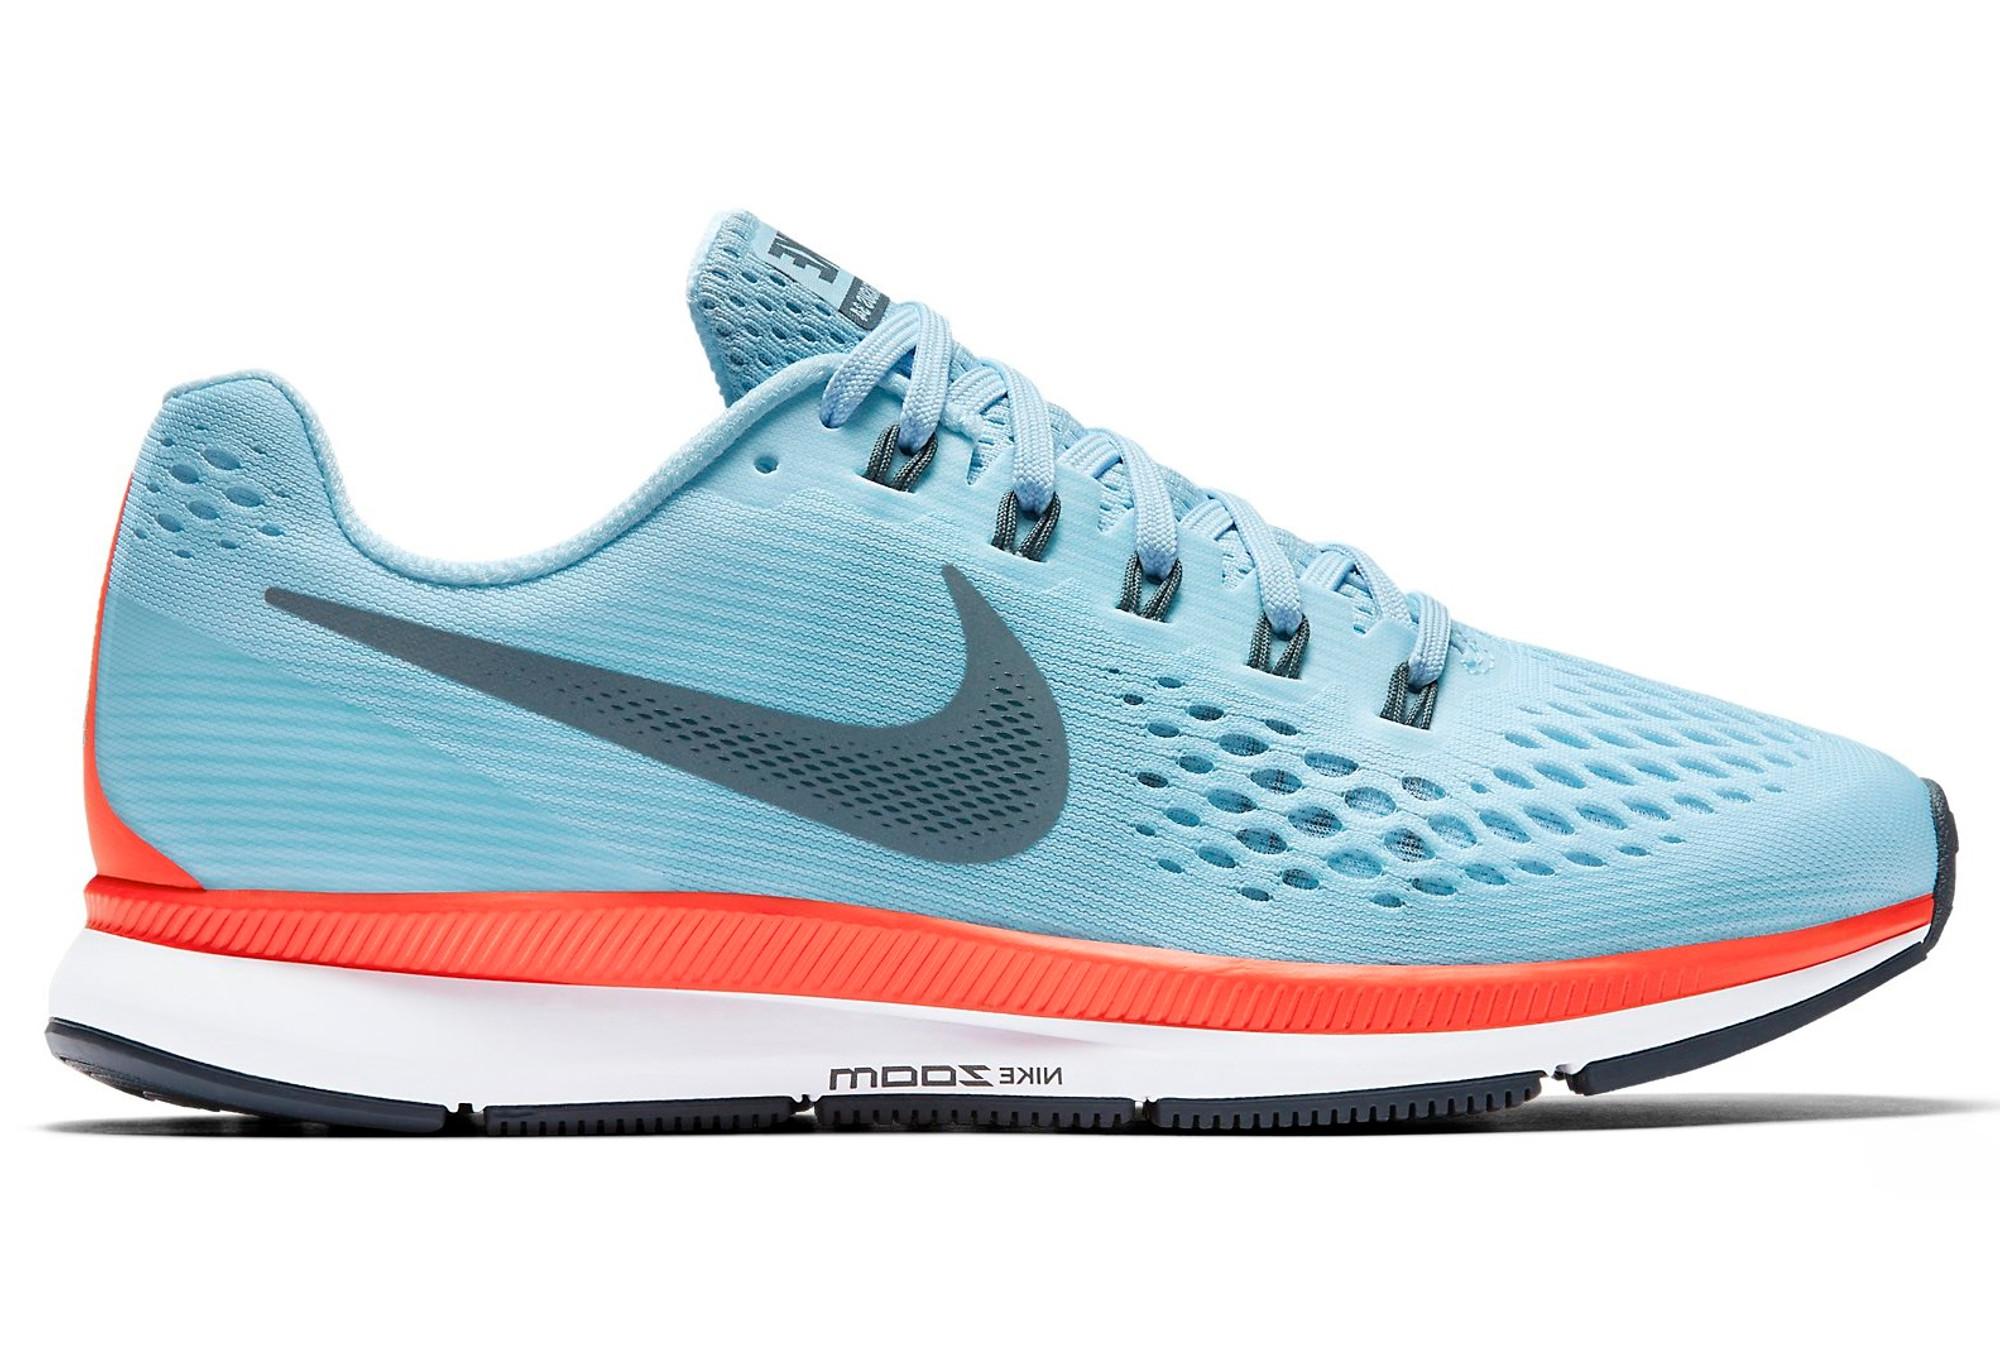 385 Eu Eu Nike Air Zoom Pegasus 34 Chaussures Running Homme Bleu